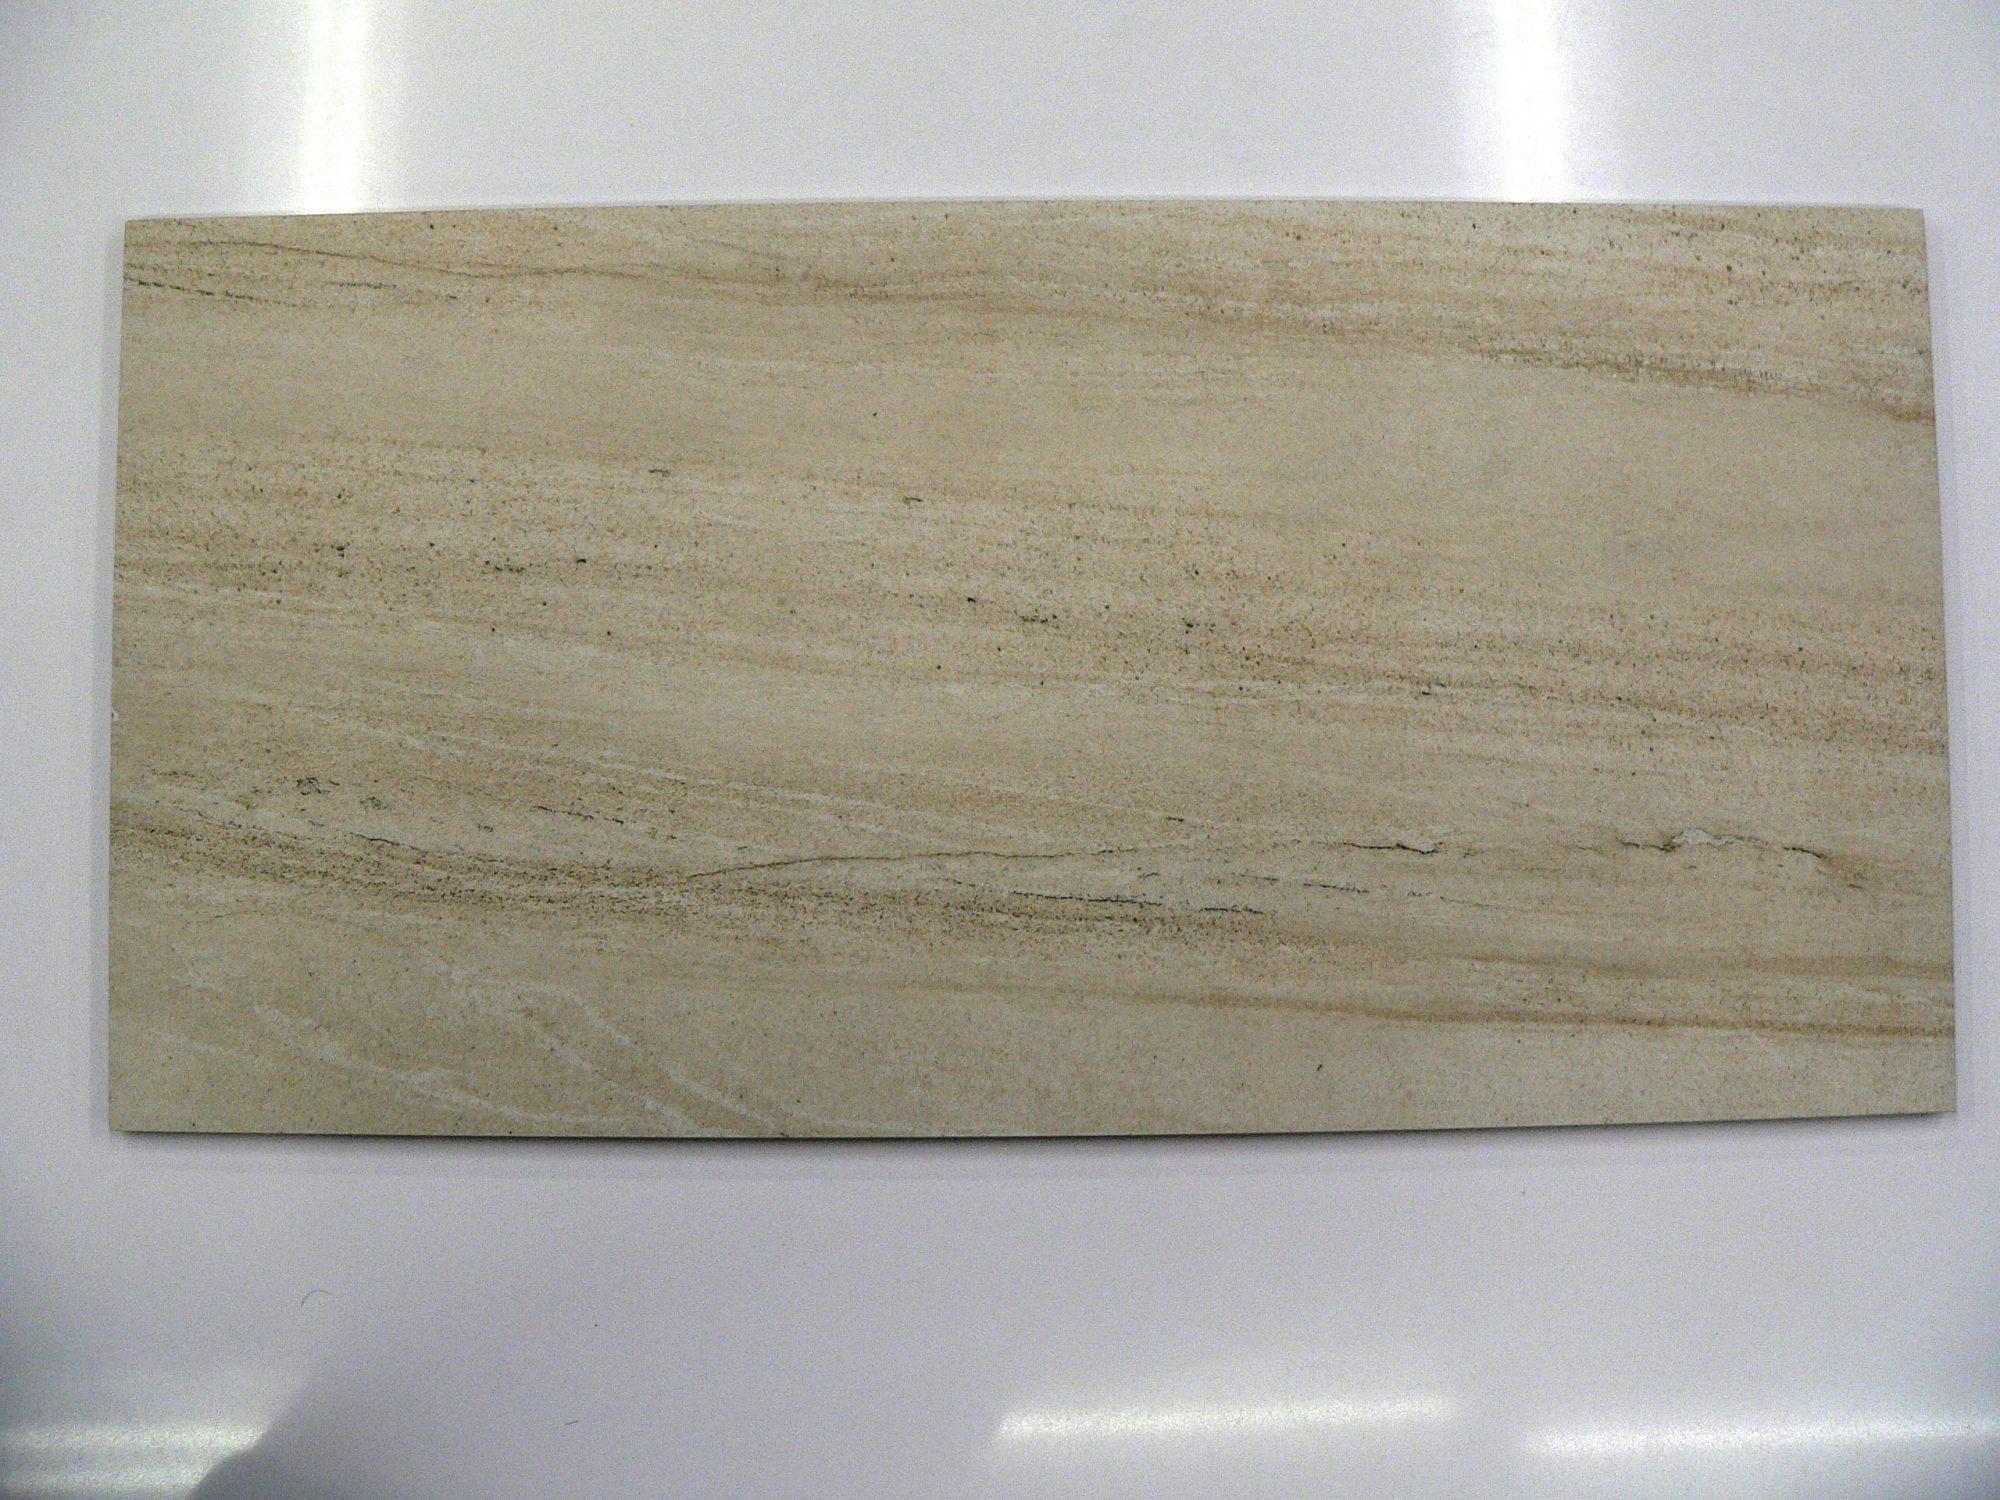 Daltile Khaki 12x24 - Phila Flooring Supply